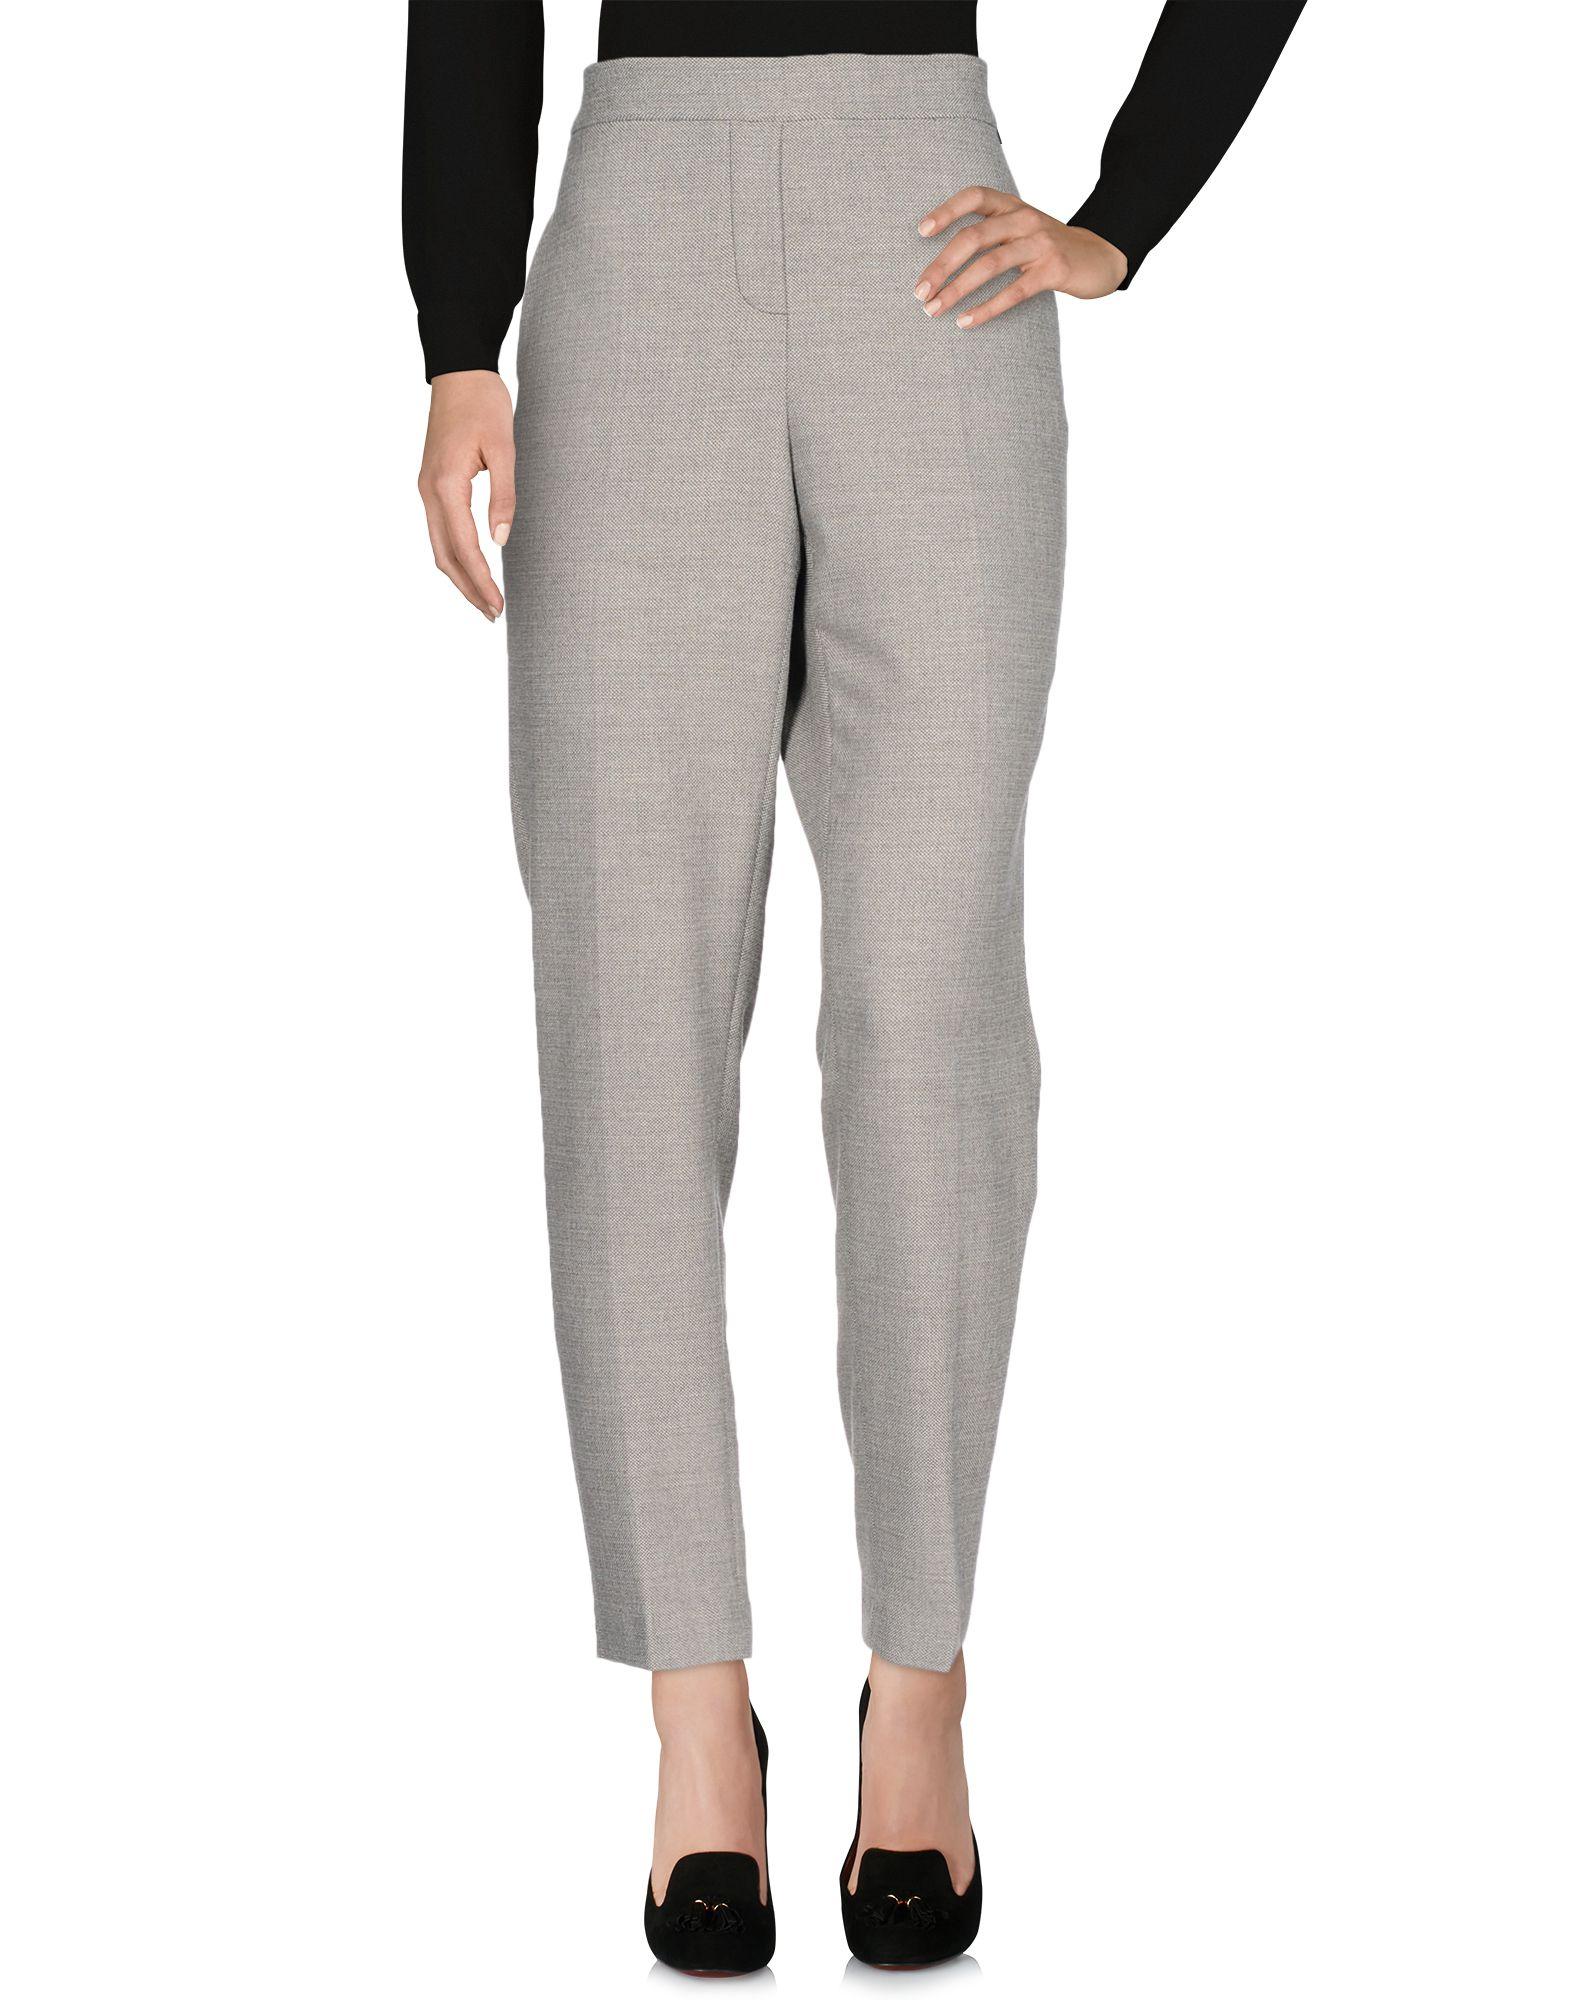 SEDUCTIVE Casual Pants in Grey